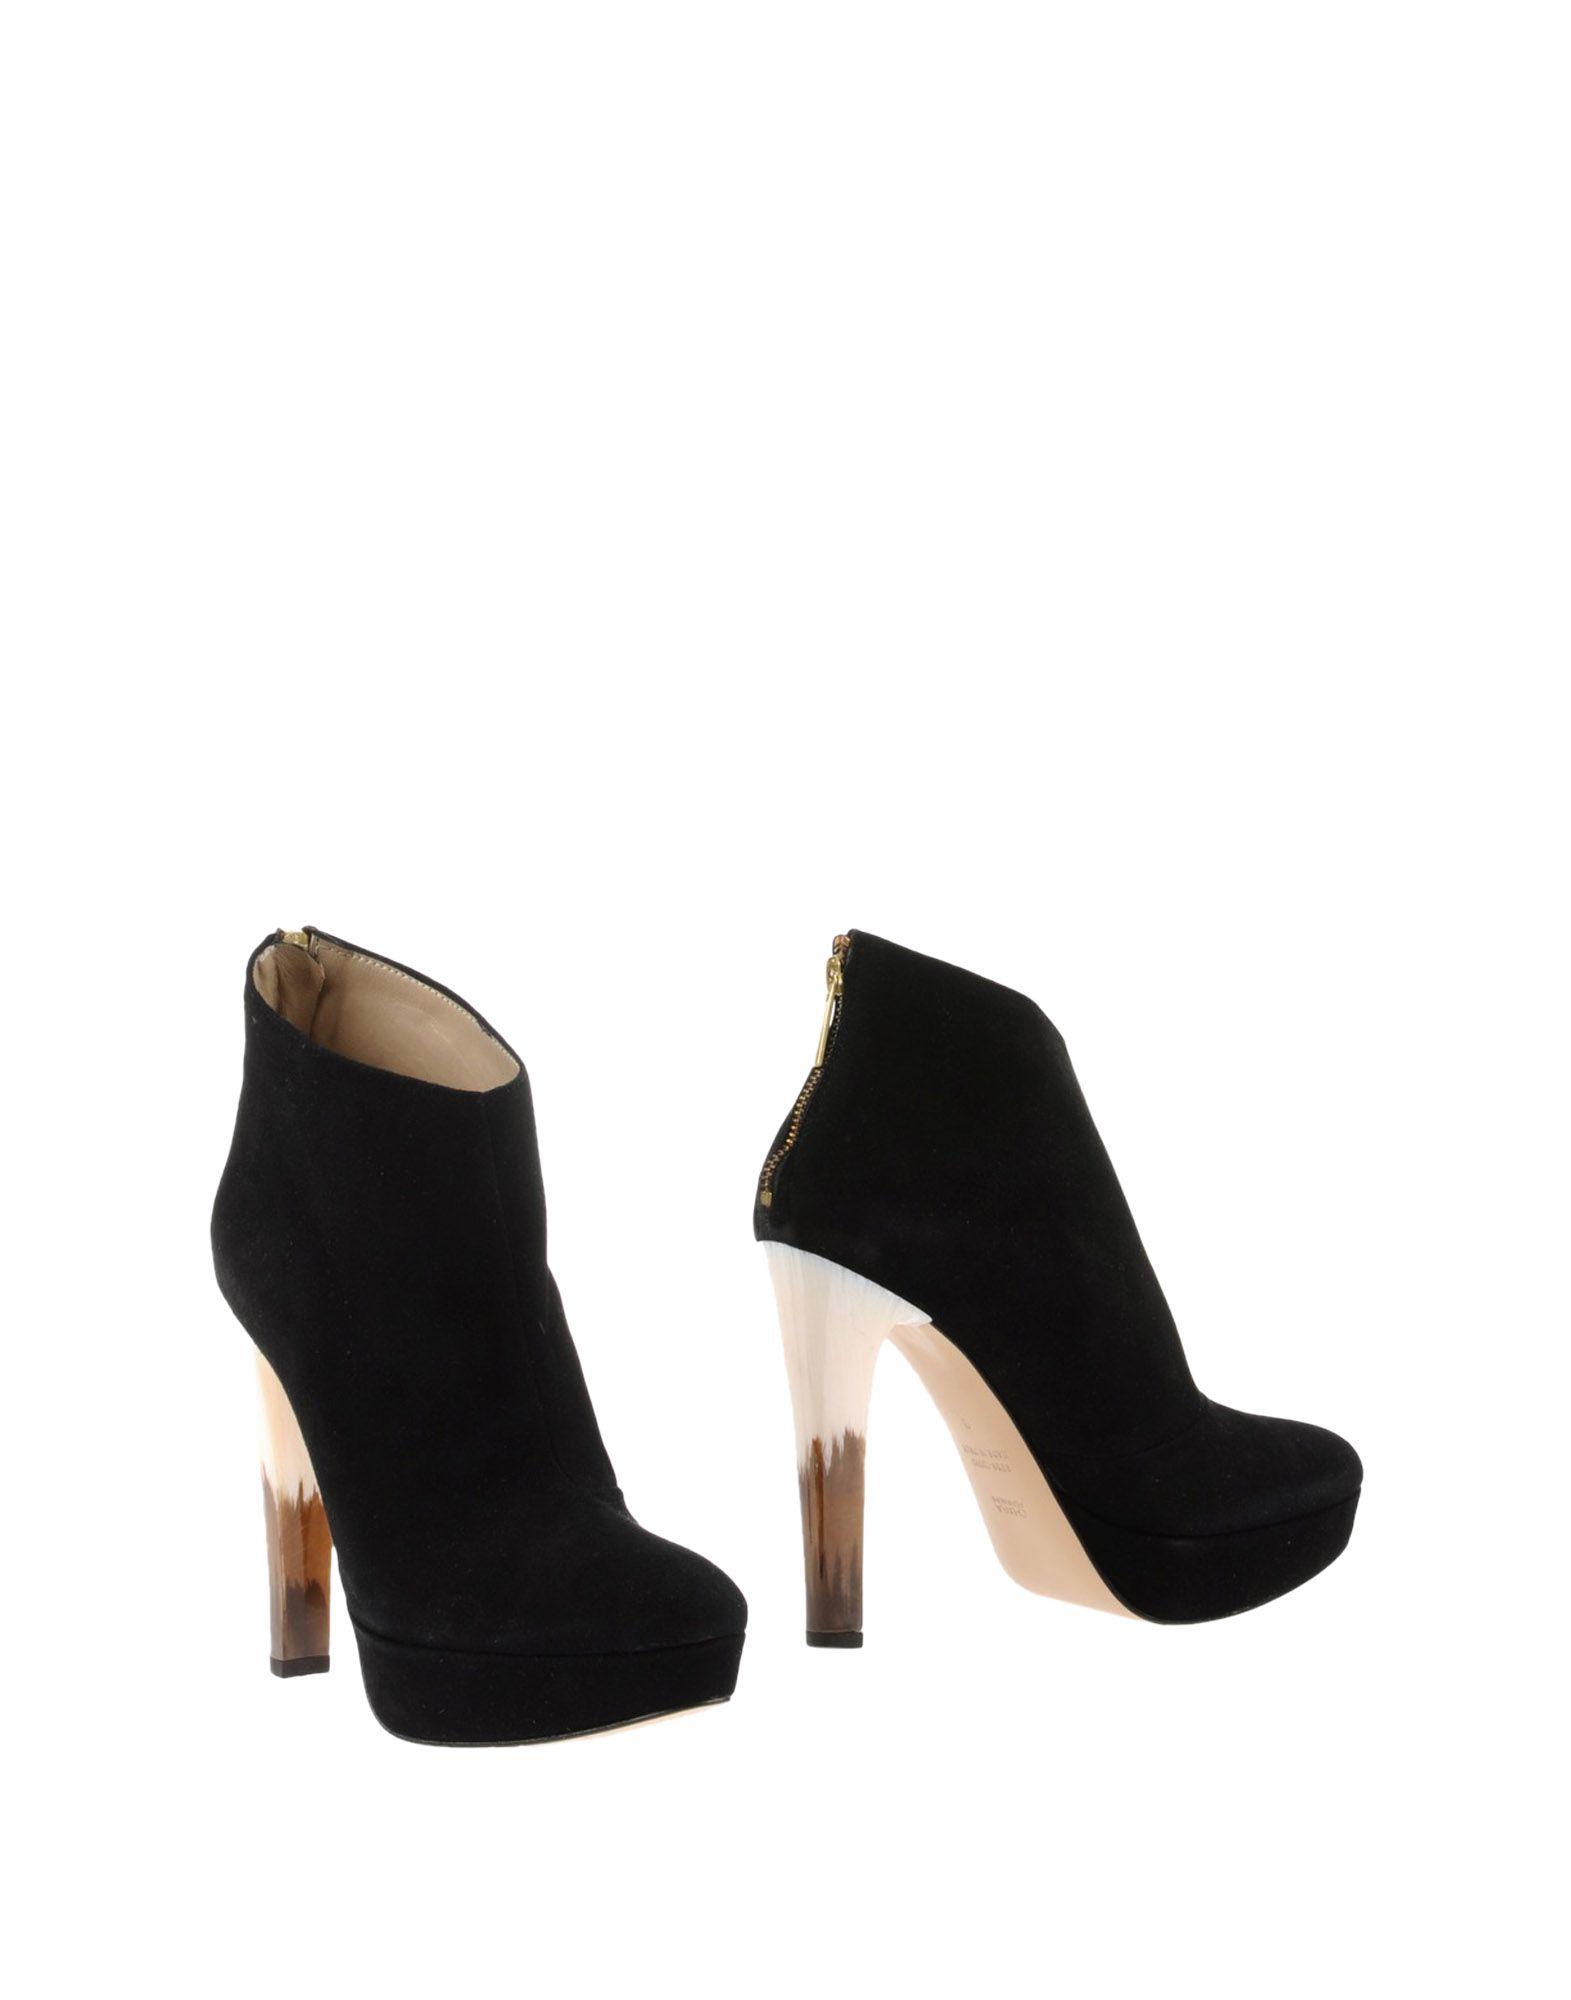 chiara ferragni shoe boots in black lyst. Black Bedroom Furniture Sets. Home Design Ideas